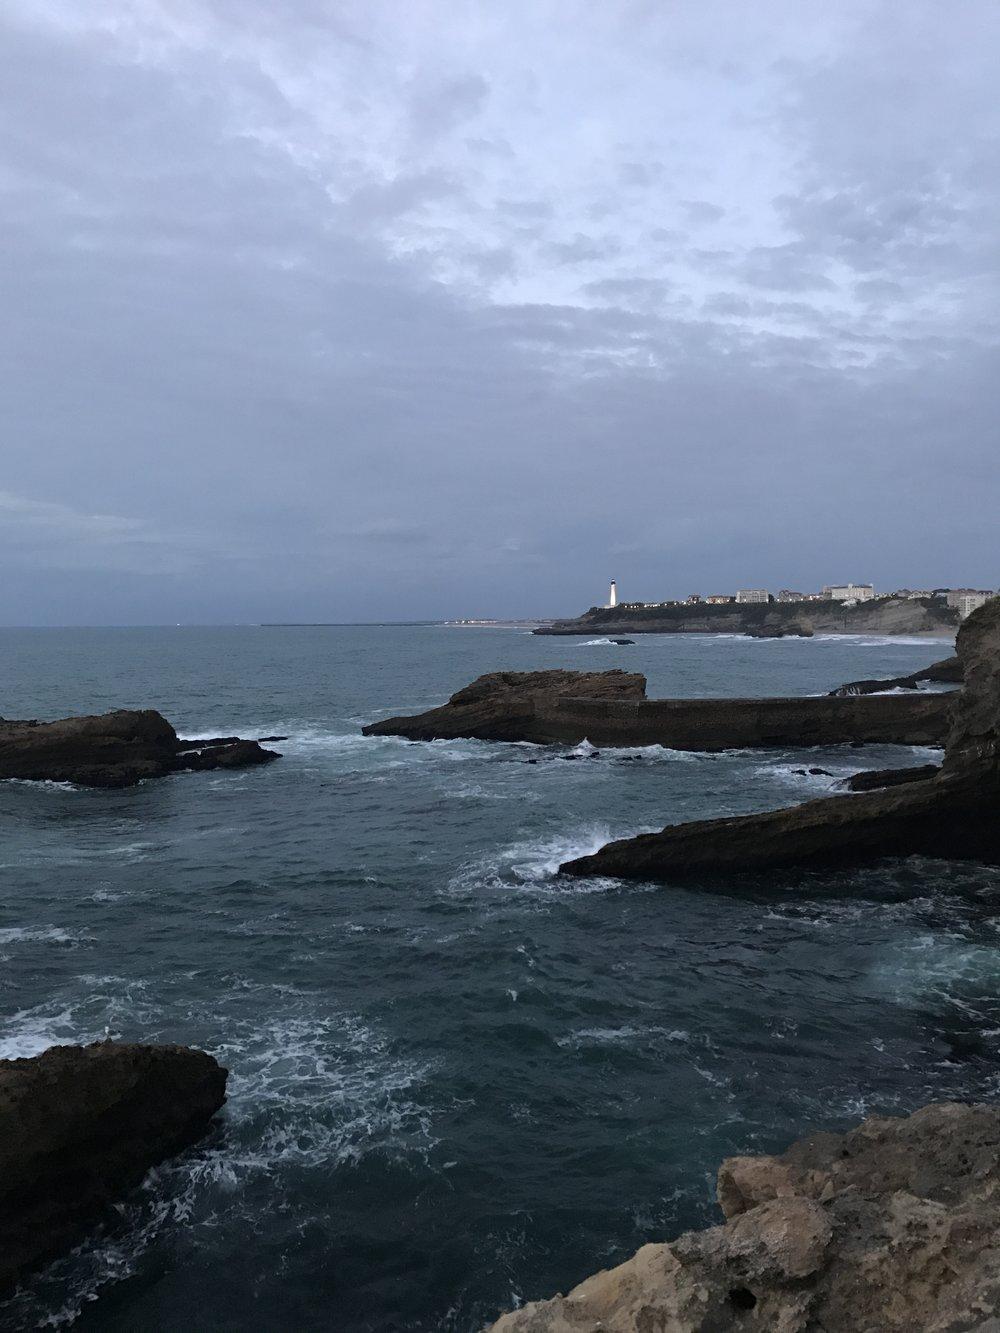 View from Rocher de la Vierge. Biarritz, France.